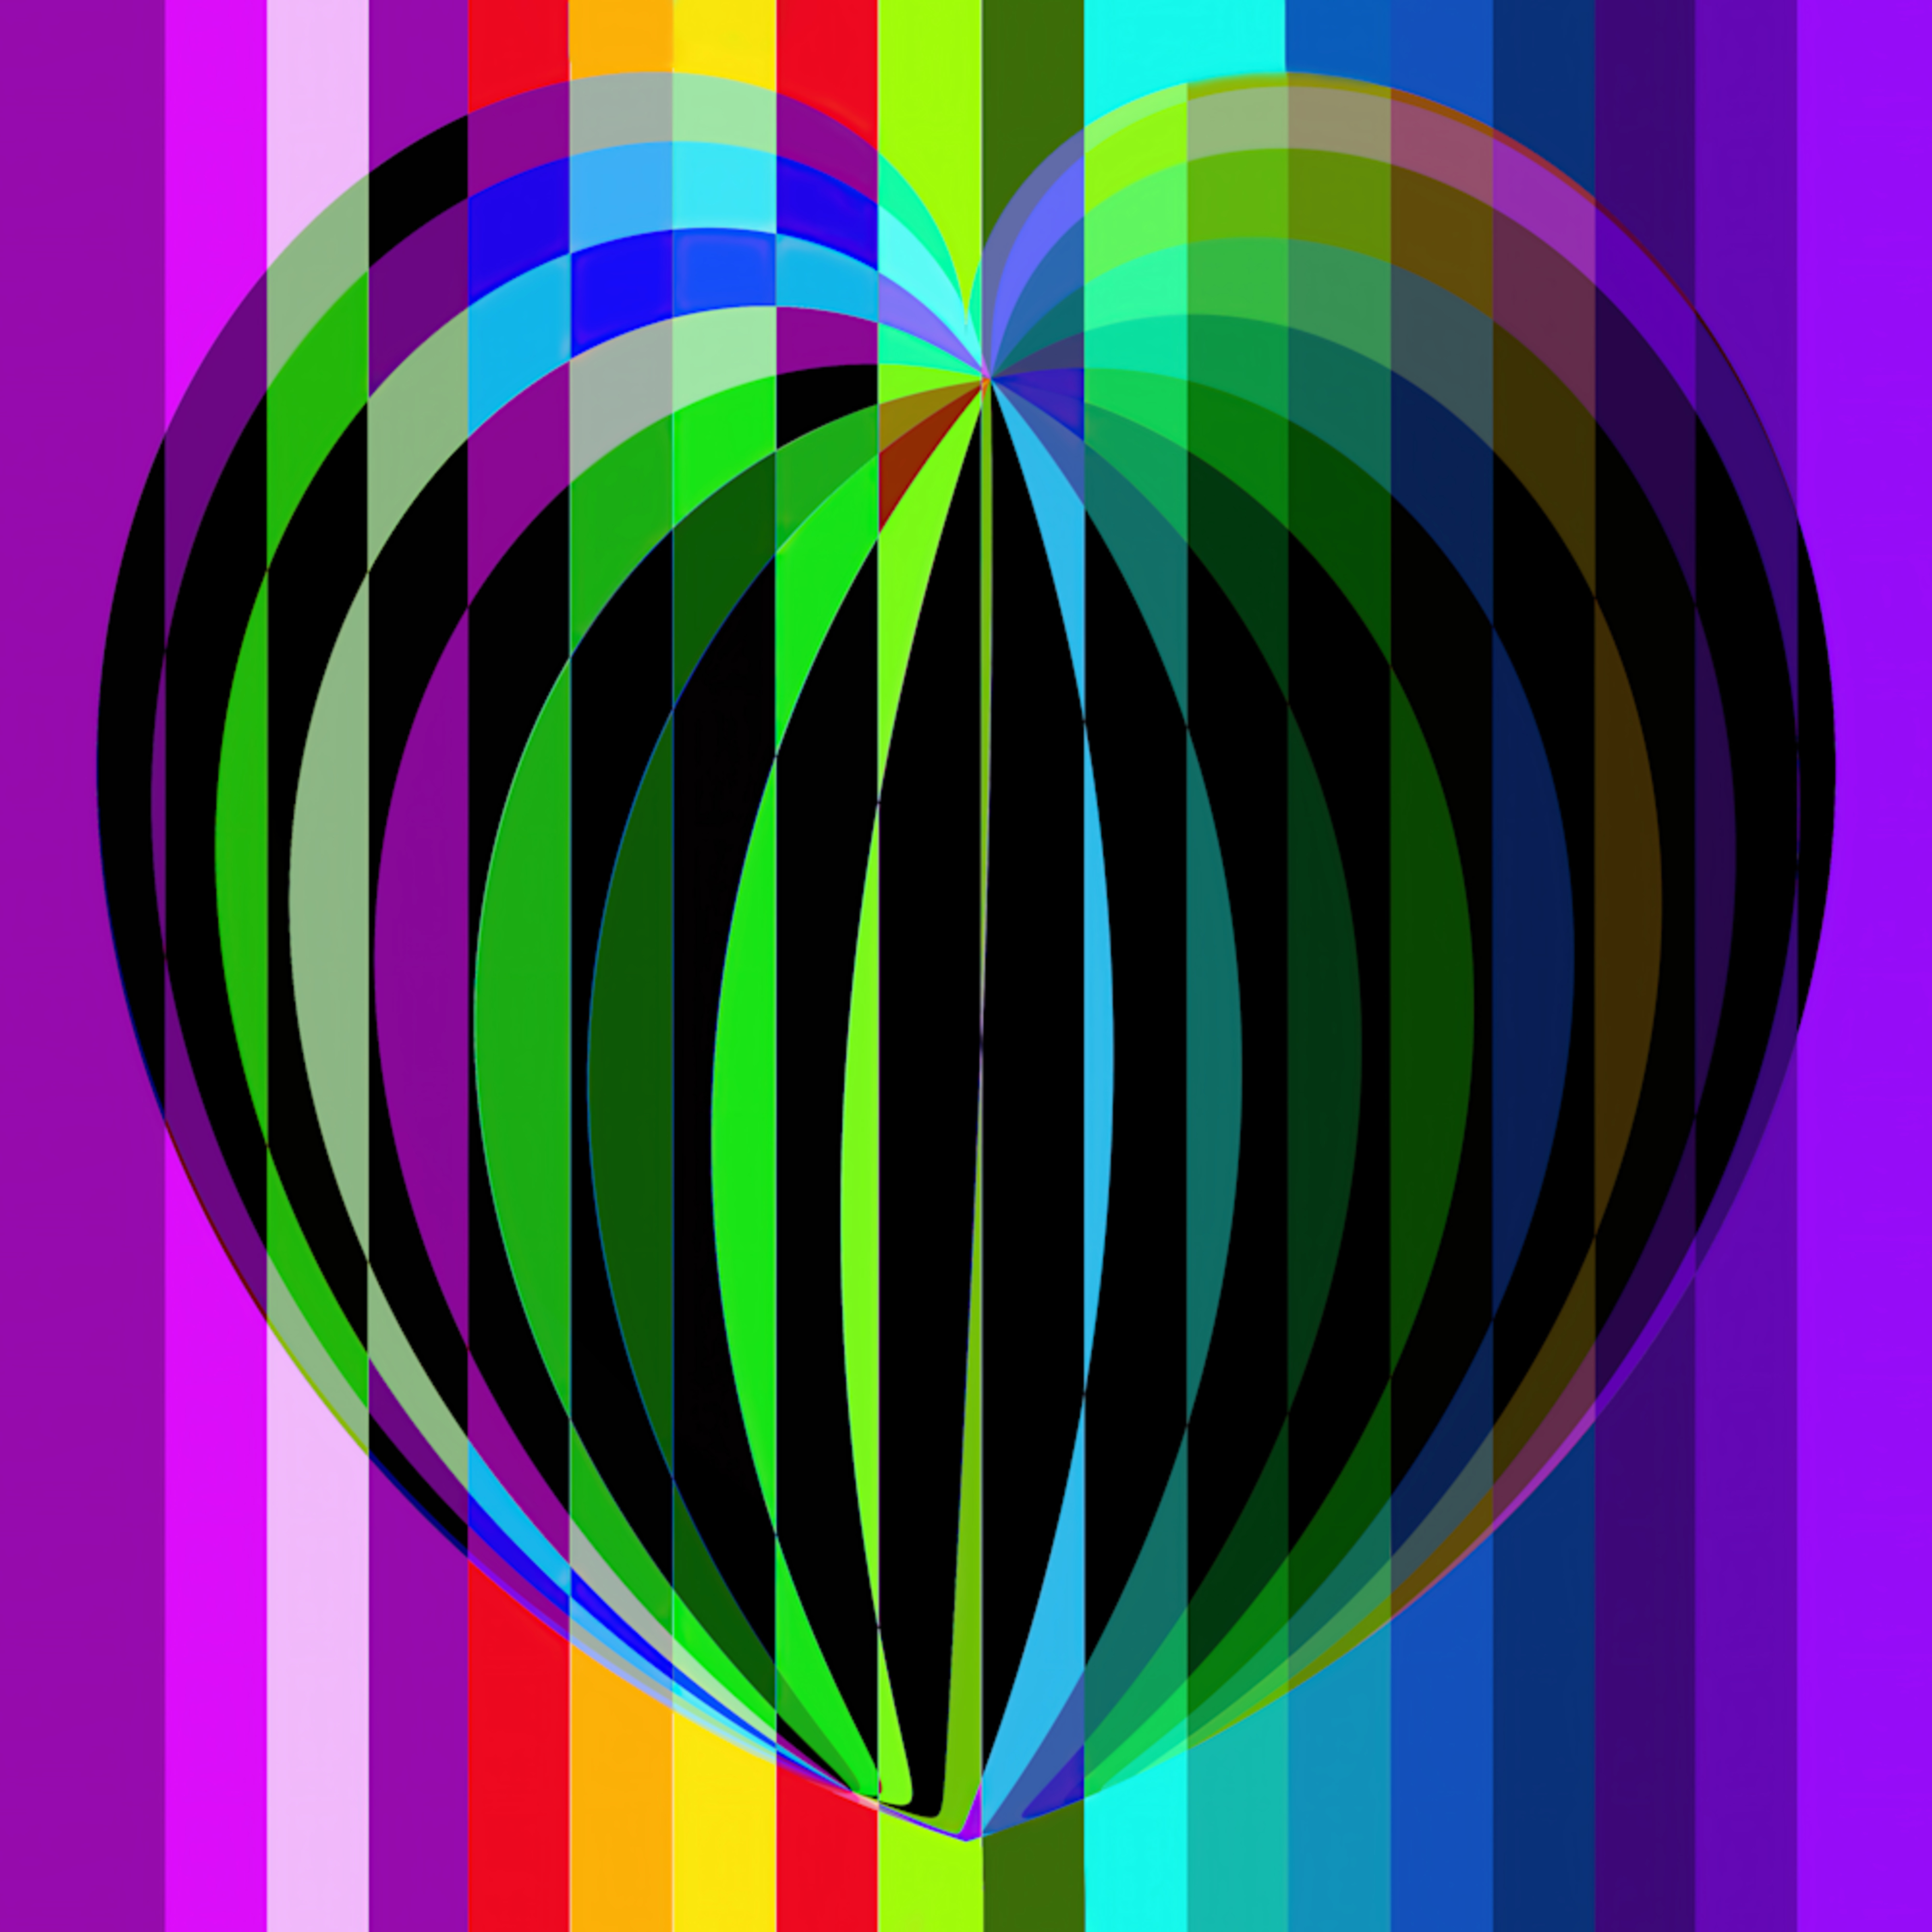 Prismatic heart ha5ded